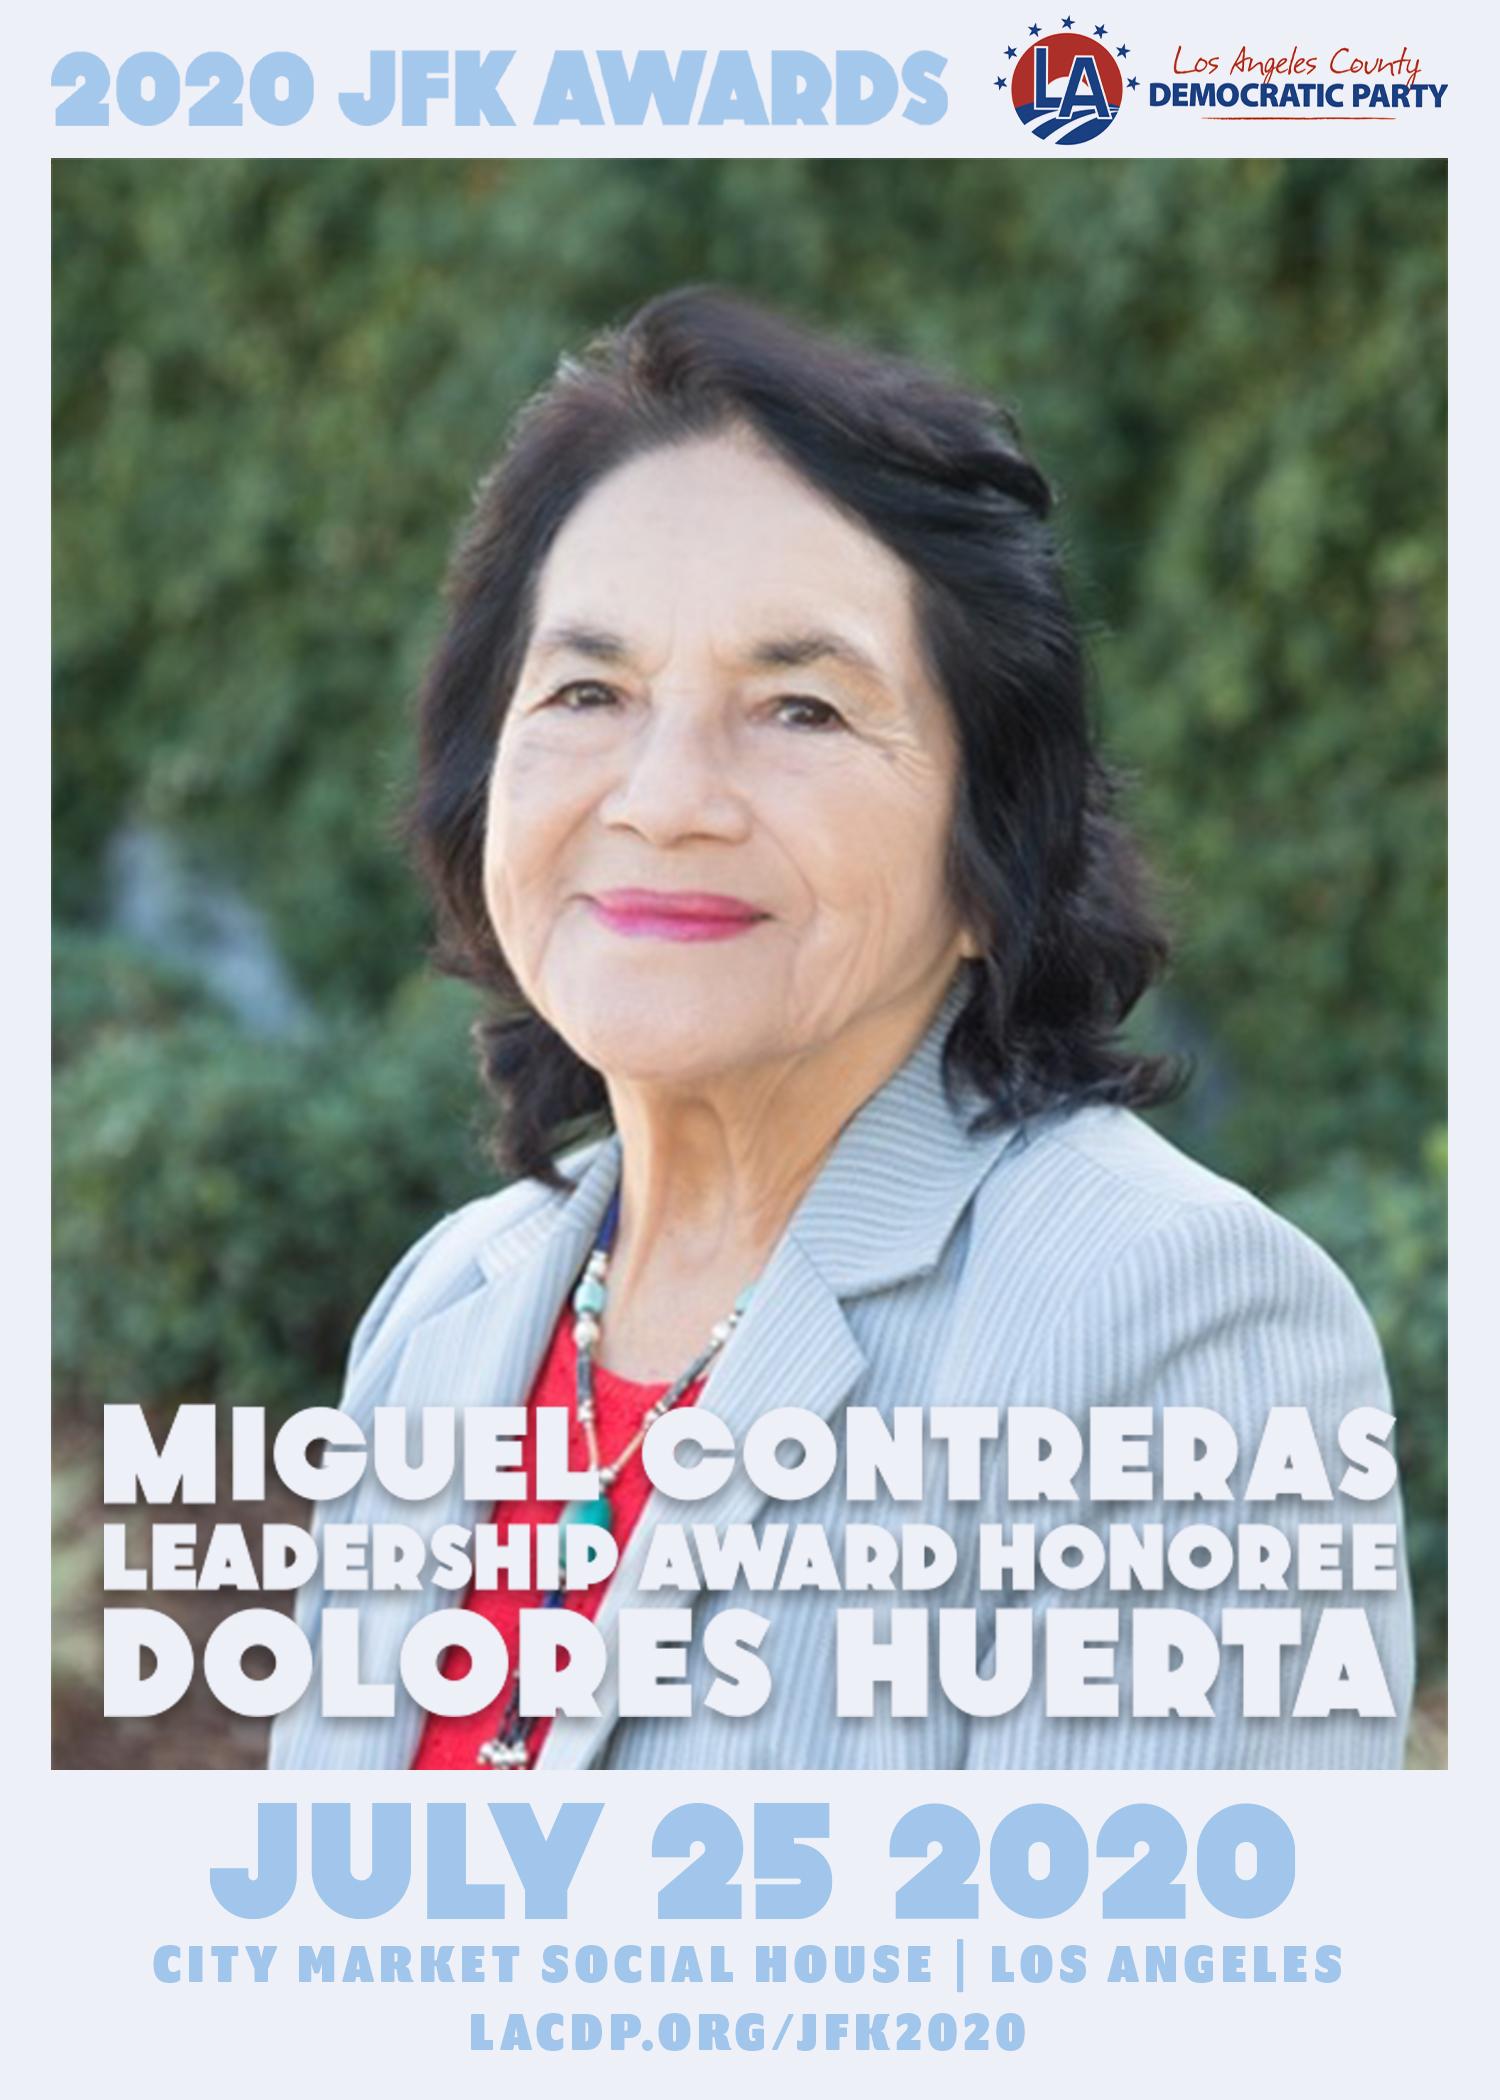 DoloresJuly.jpg